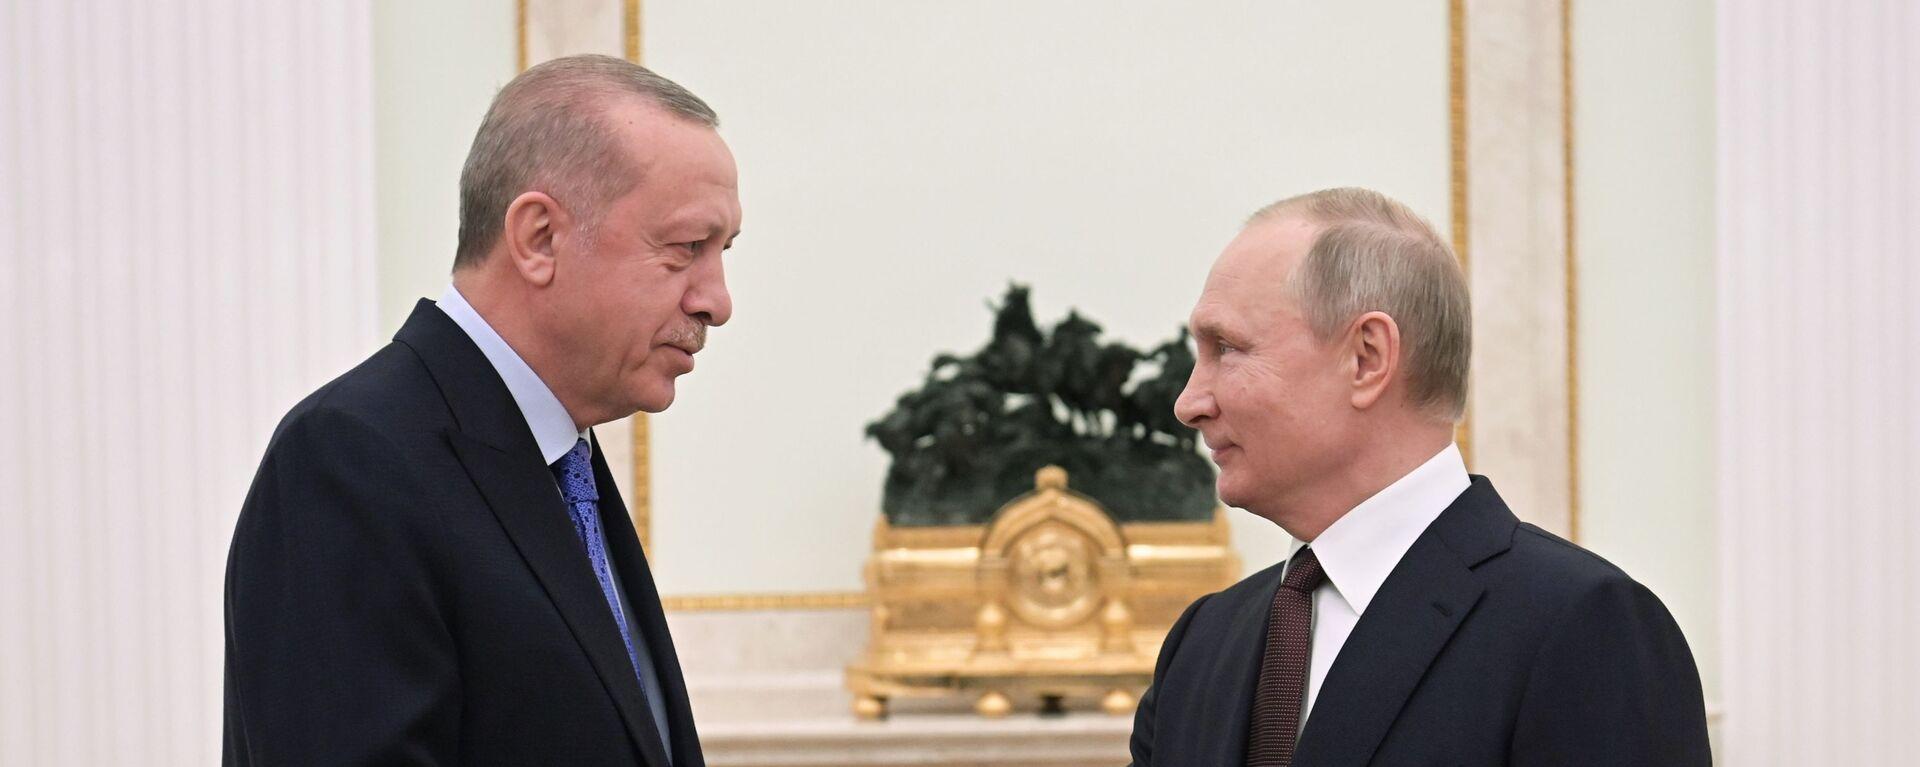 Владимир Путин и Реджеп Тайип Эрдоган  - Sputnik Արմենիա, 1920, 24.09.2021